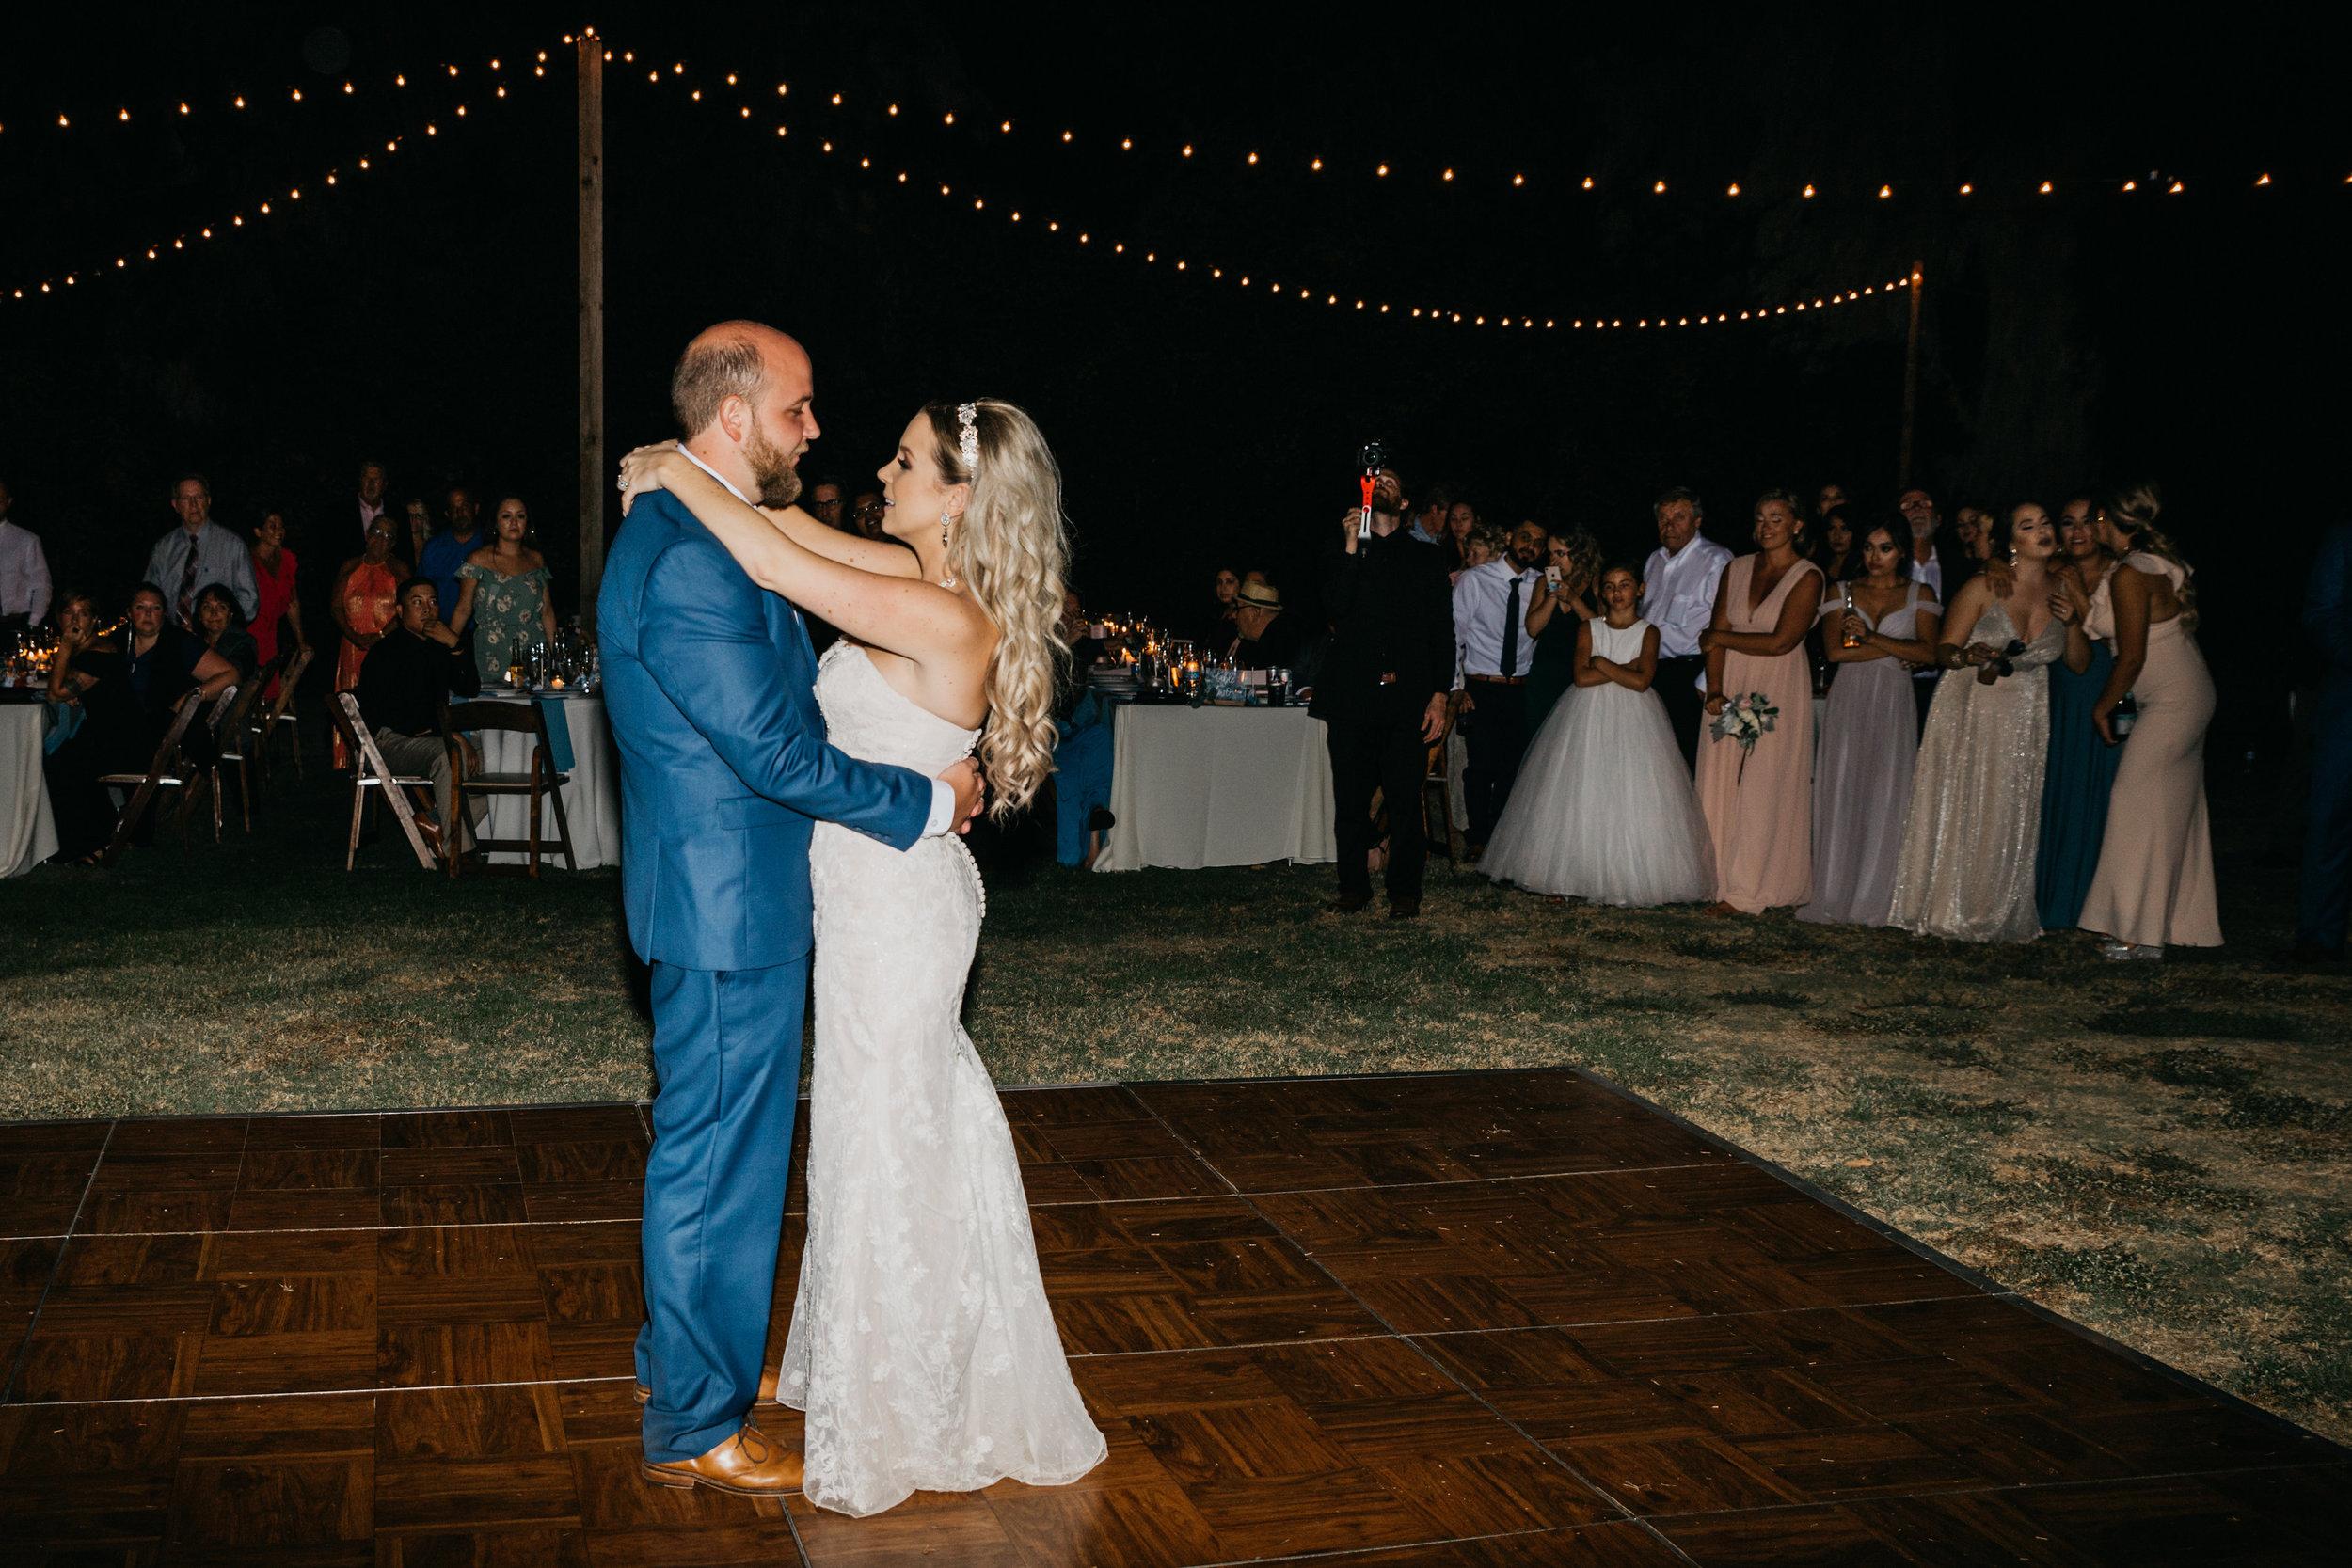 DianaLakePhoto-L+M-San-Diego-Wedding-Reception26.jpg